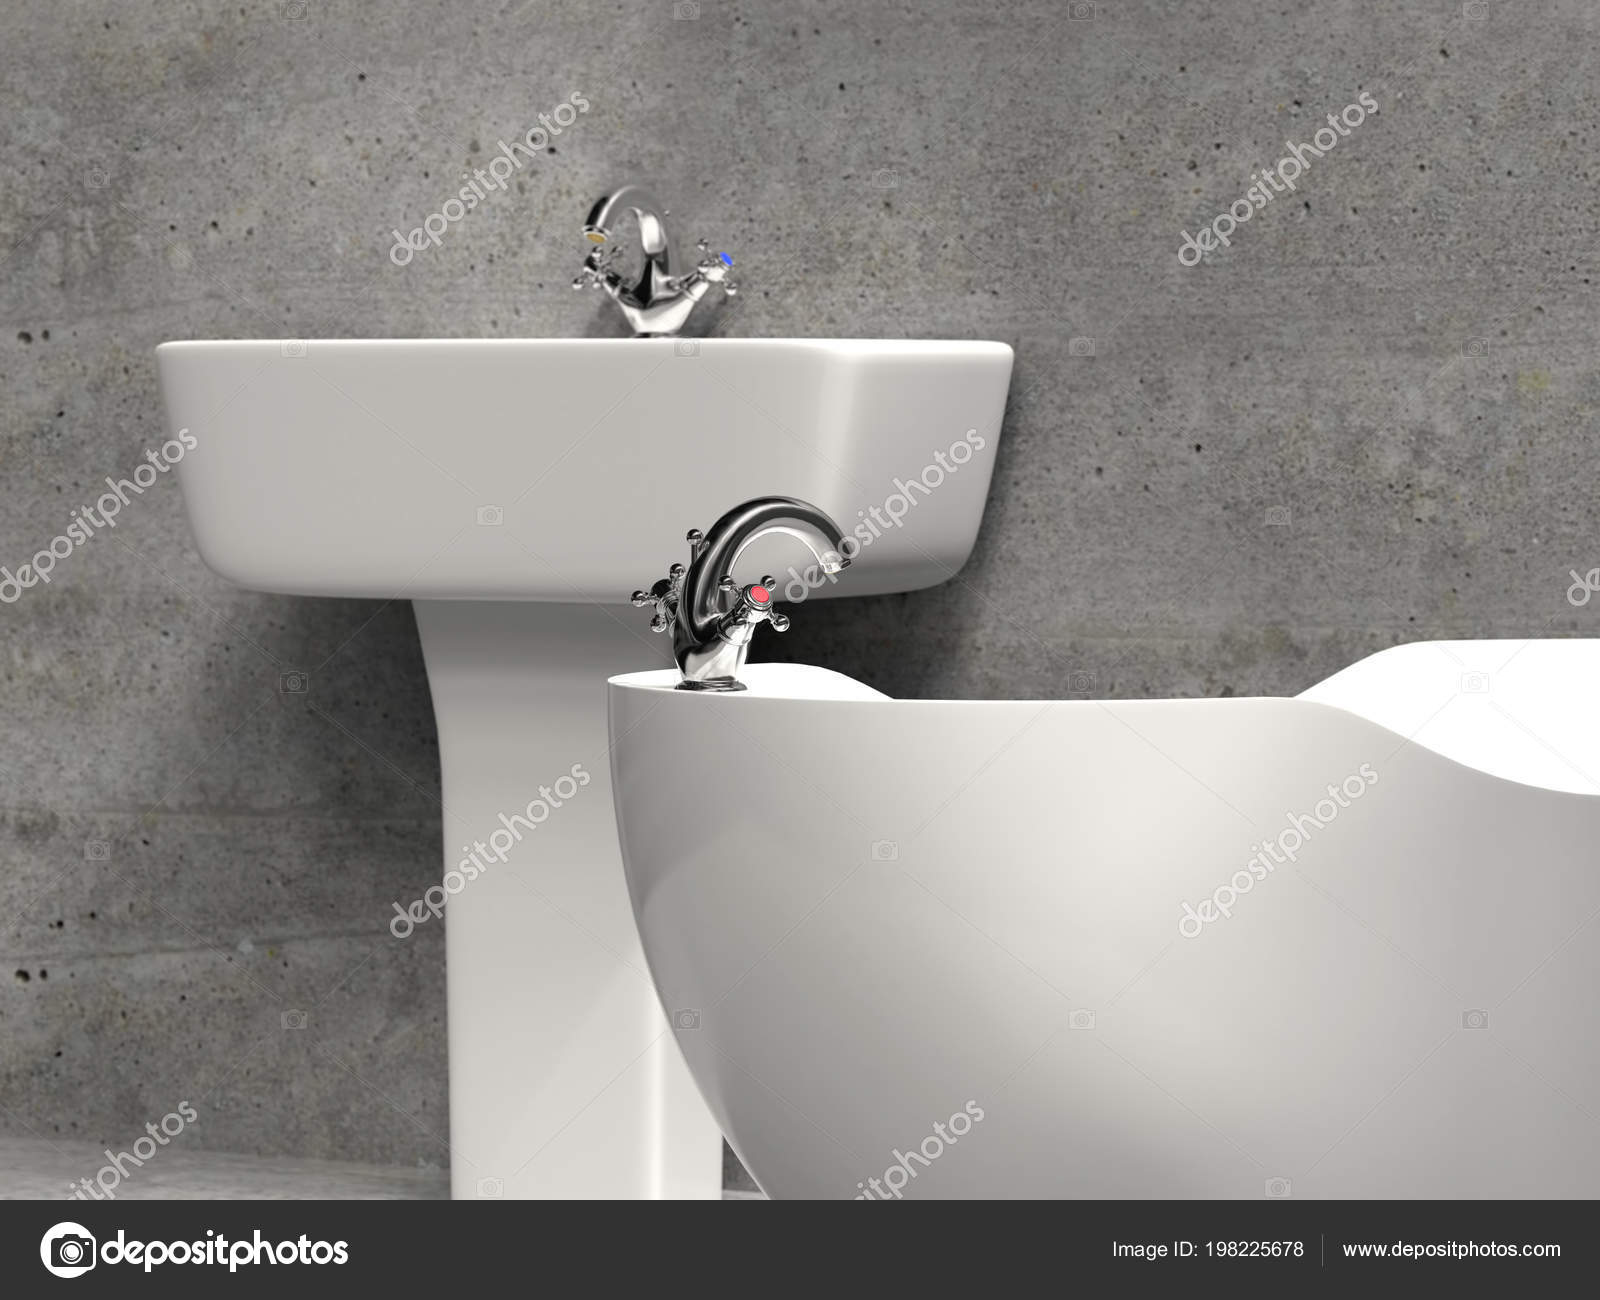 Baignoire Lavabo Baignoire Salle Bains Moderne Blanc Grunge Gris Mur ...